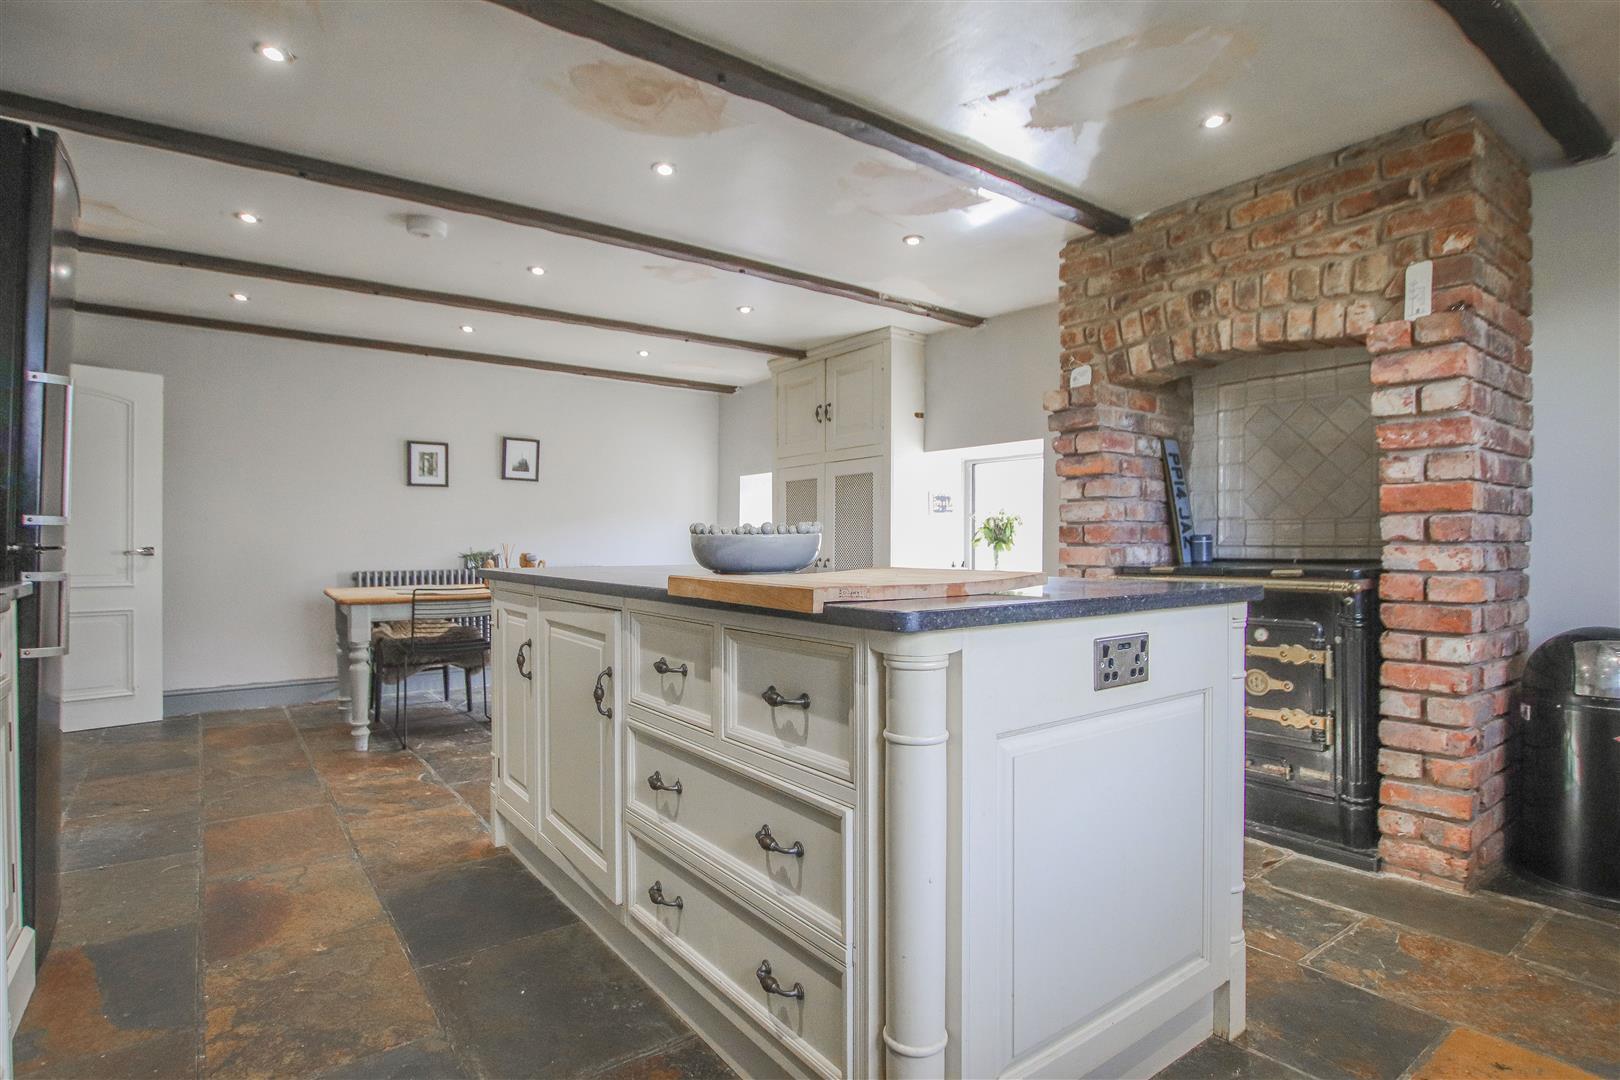 6 Bedroom Barn Conversion For Sale - 33.JPG